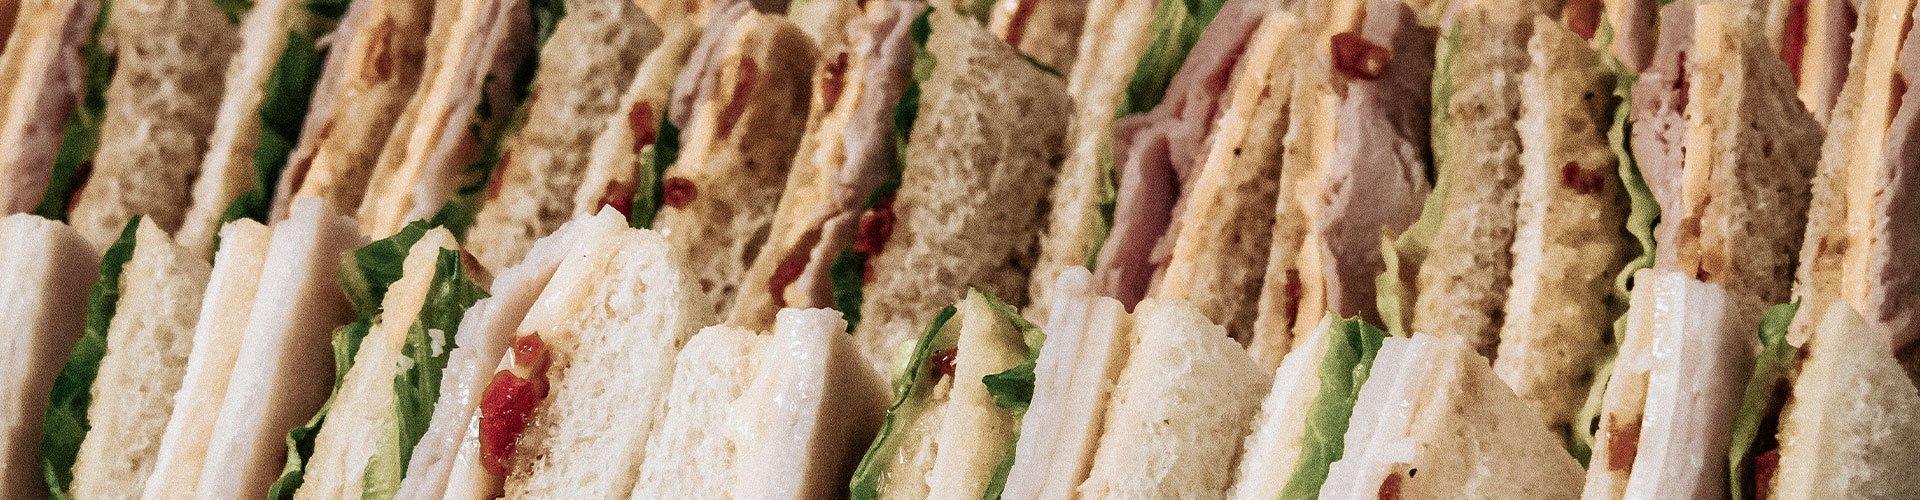 in-house prepared sandwiches